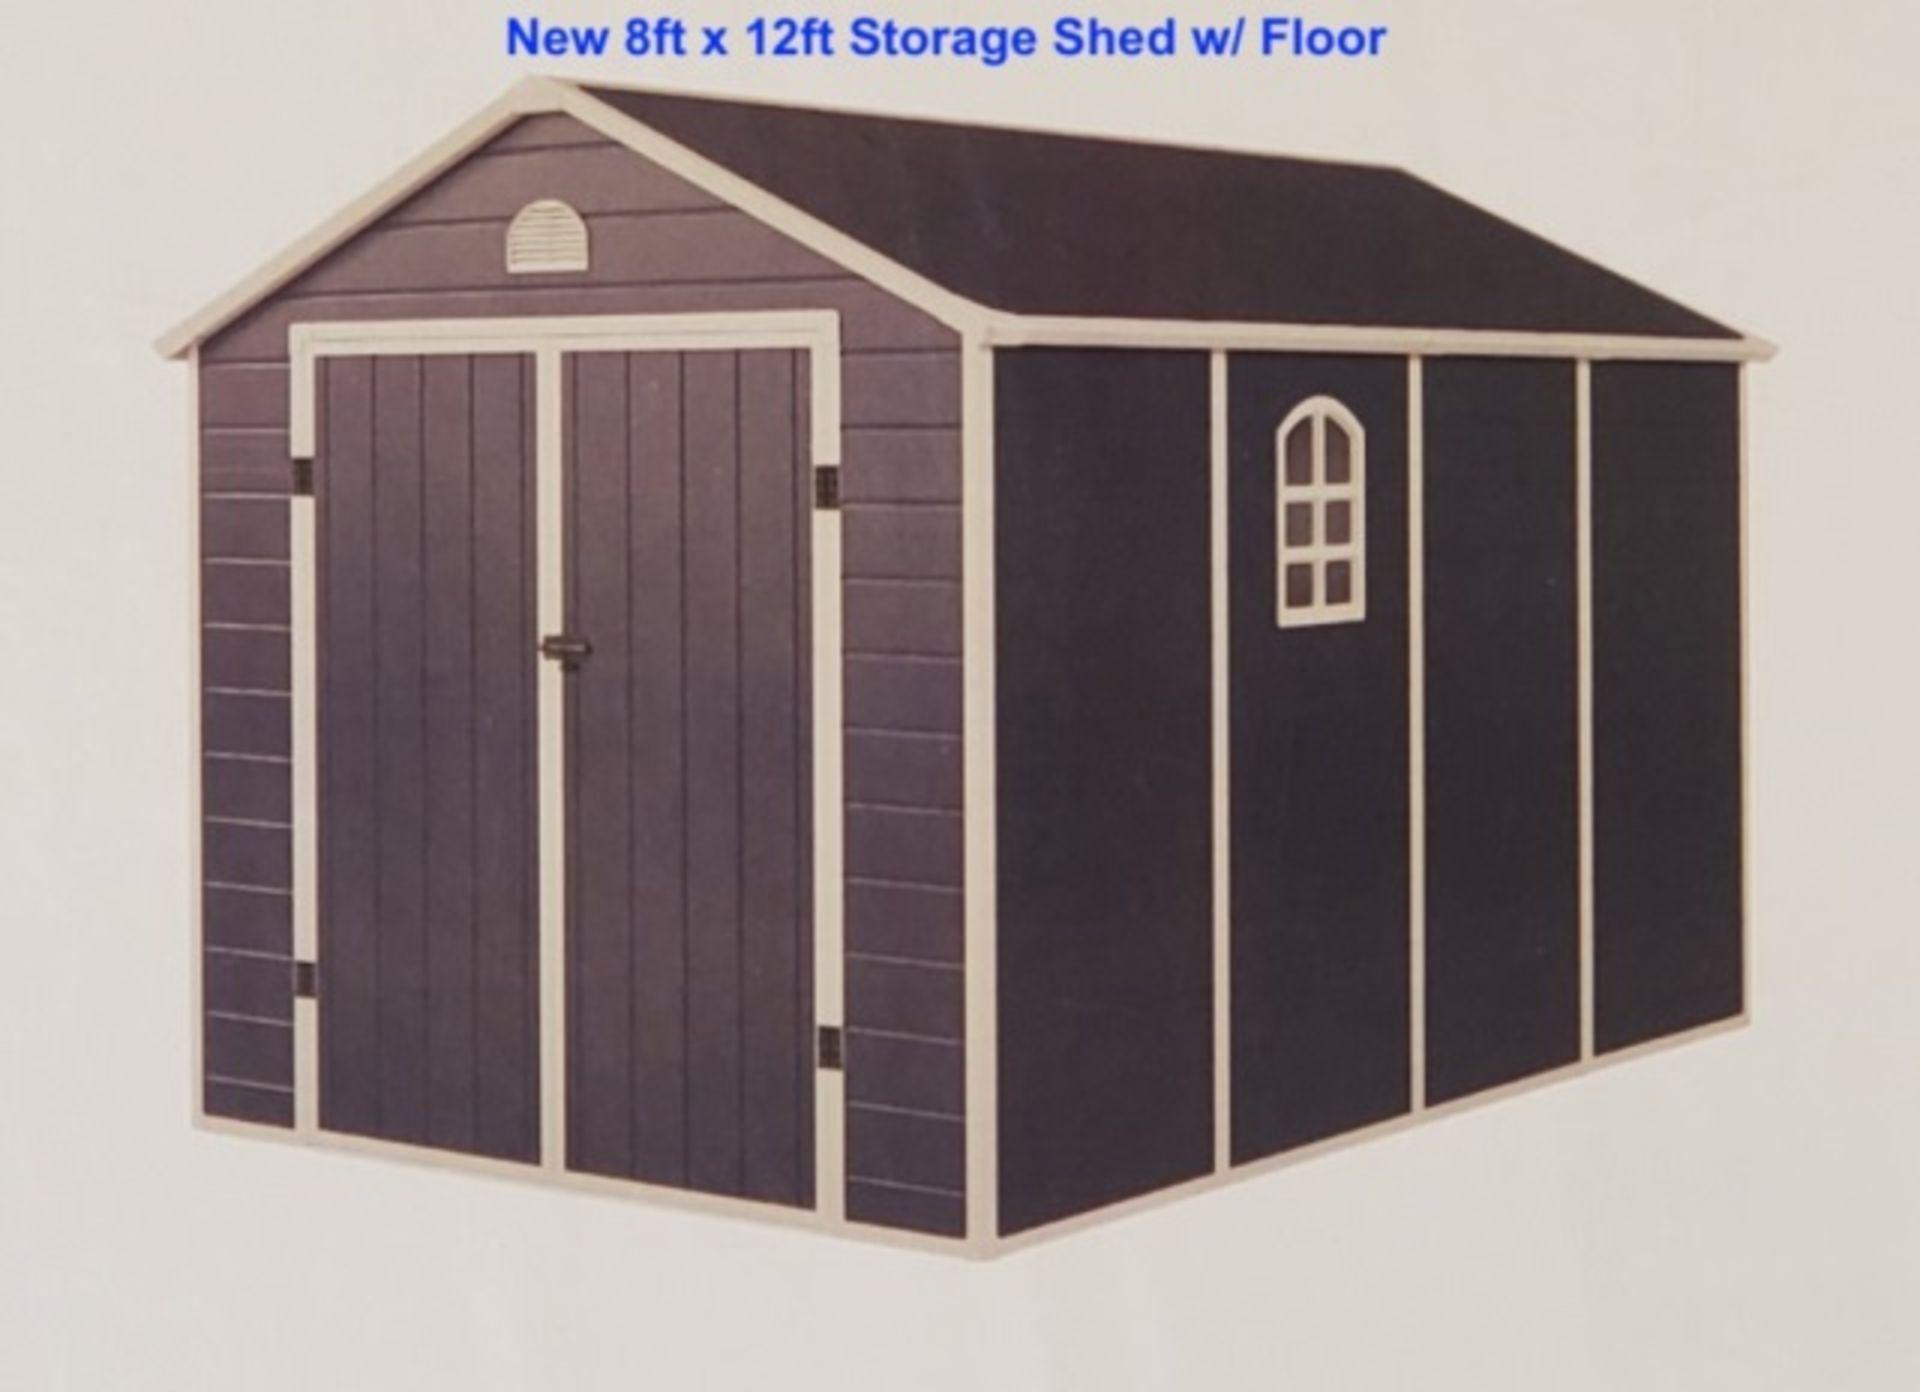 Lot 446 - Unused 8' x 12' Storage Shed W/Floor